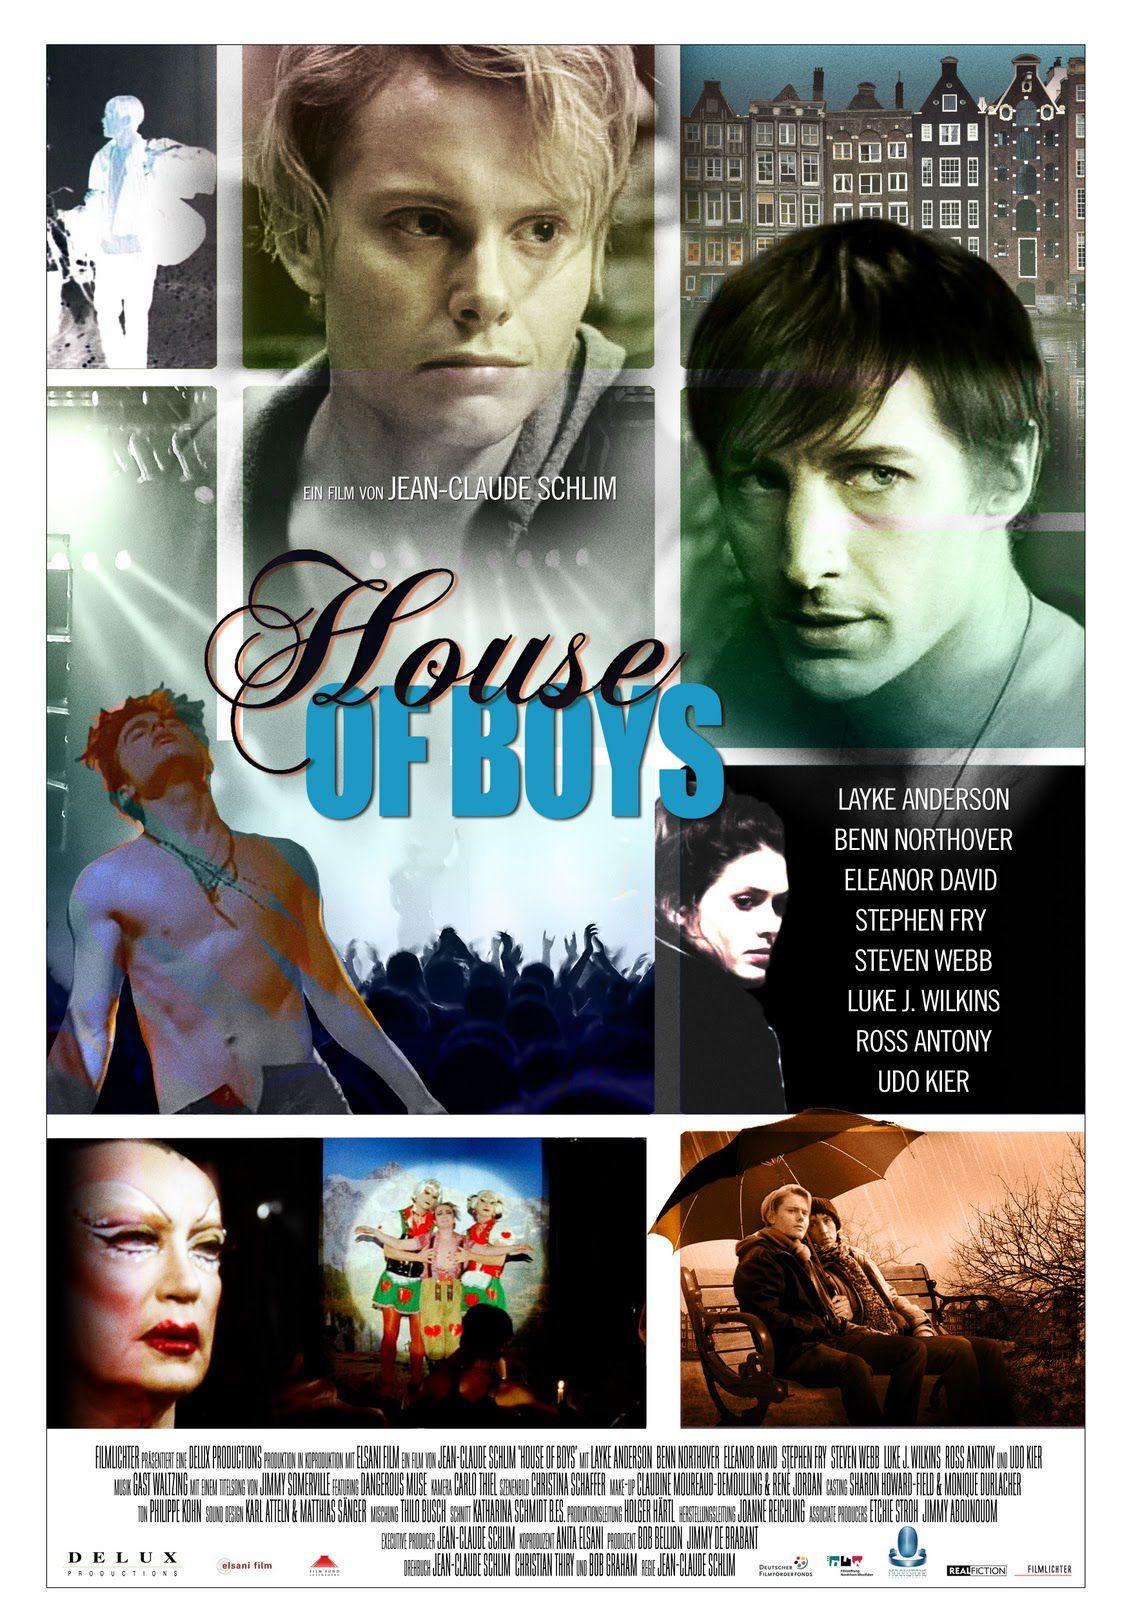 House of Boys - Film (2009)